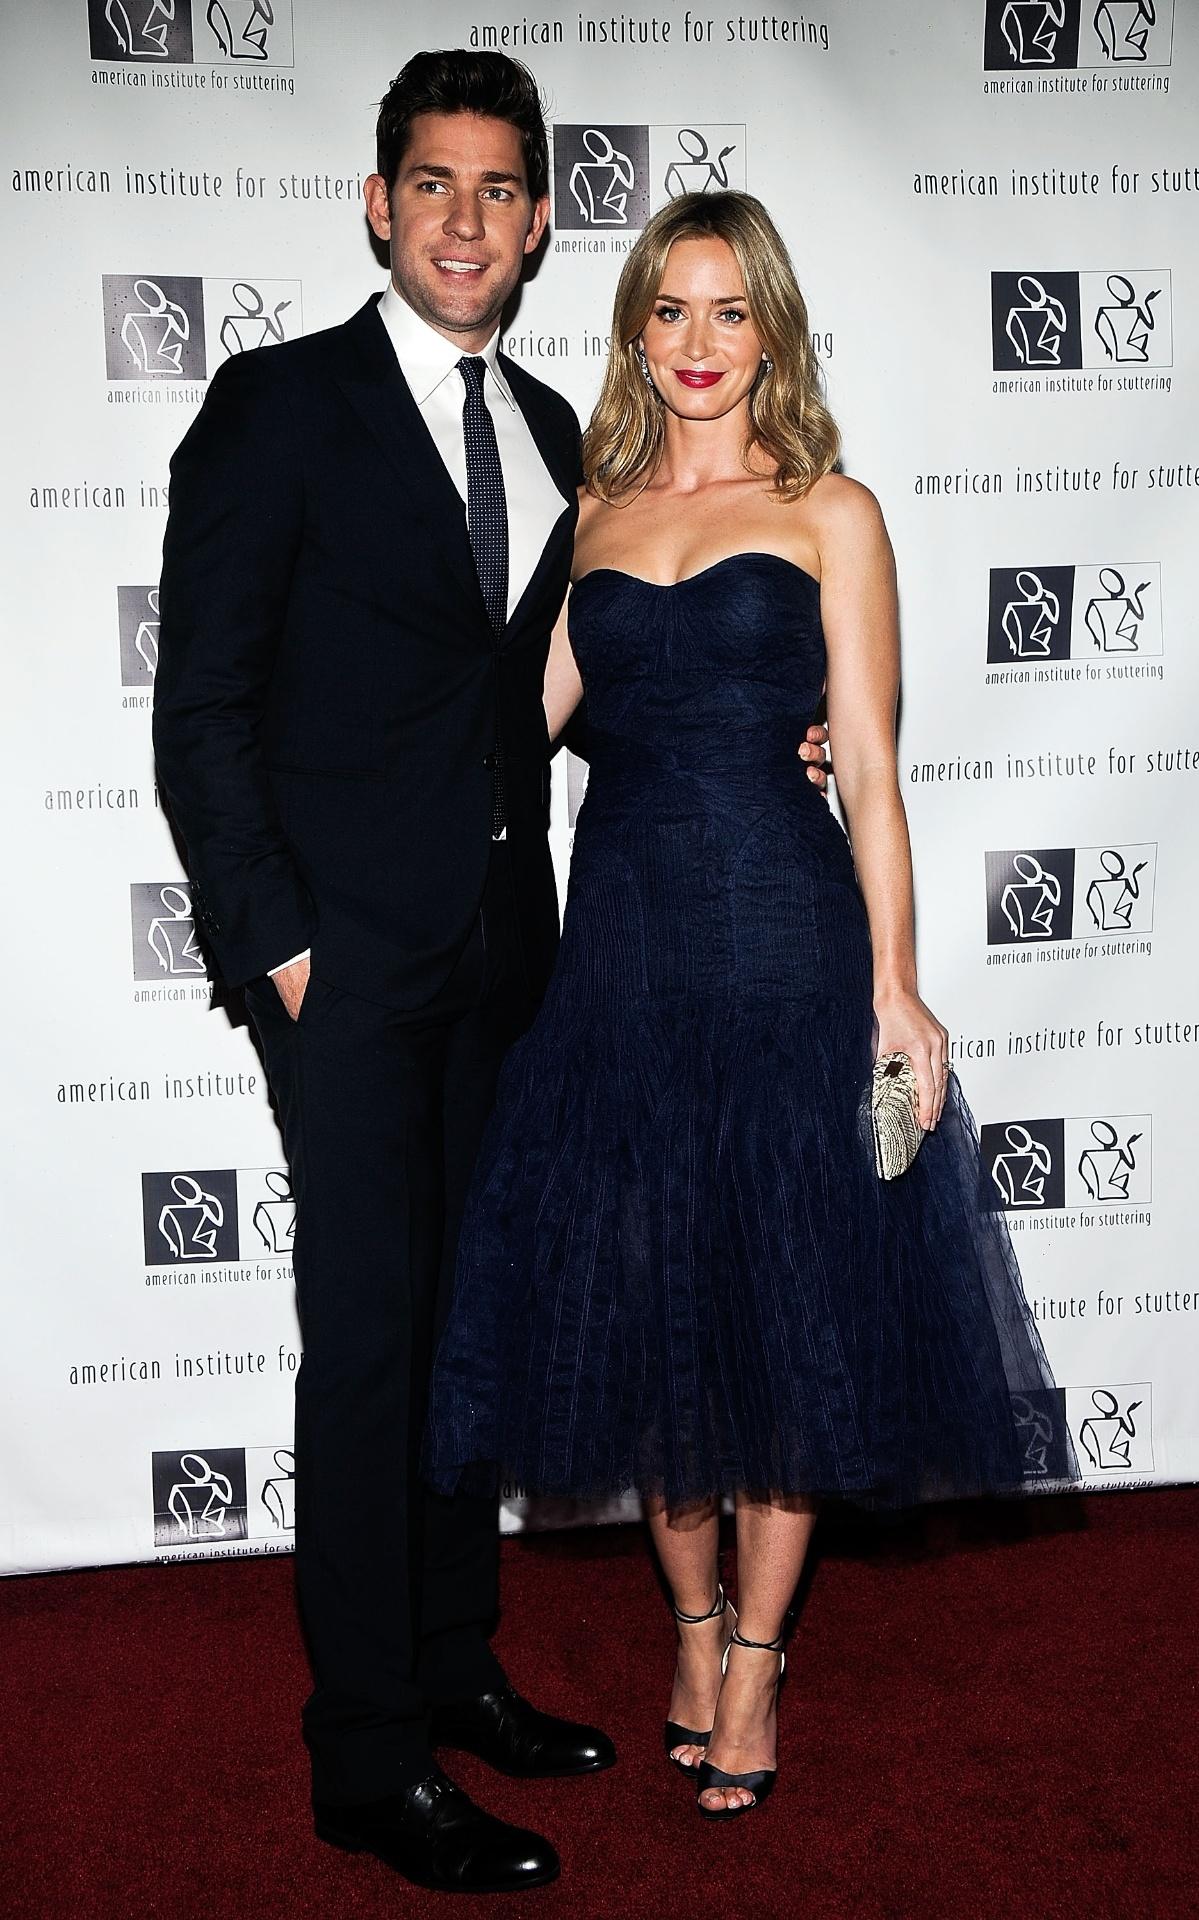 3.jun.2013 - John Krasinski e Emily Blunt no 7º baile beneficente